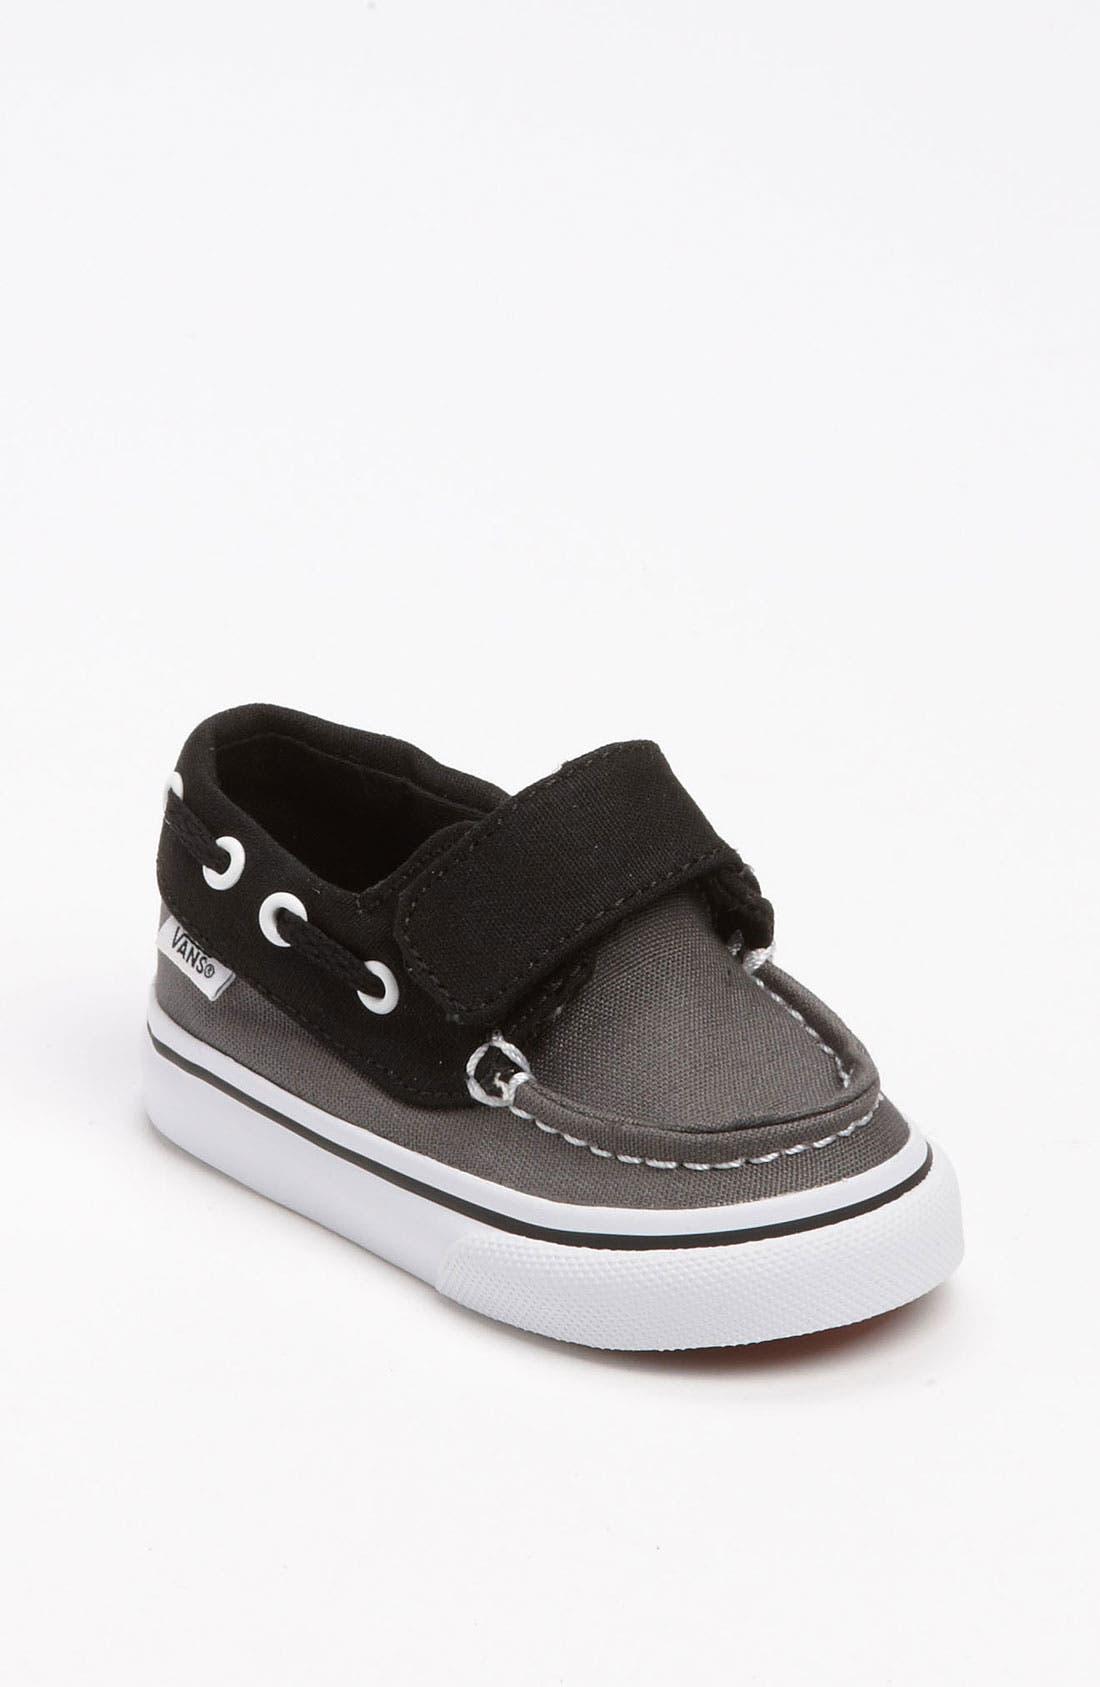 Main Image - Vans 'Zapato del Barco V' Boat Shoe (Baby, Walker & Toddler)